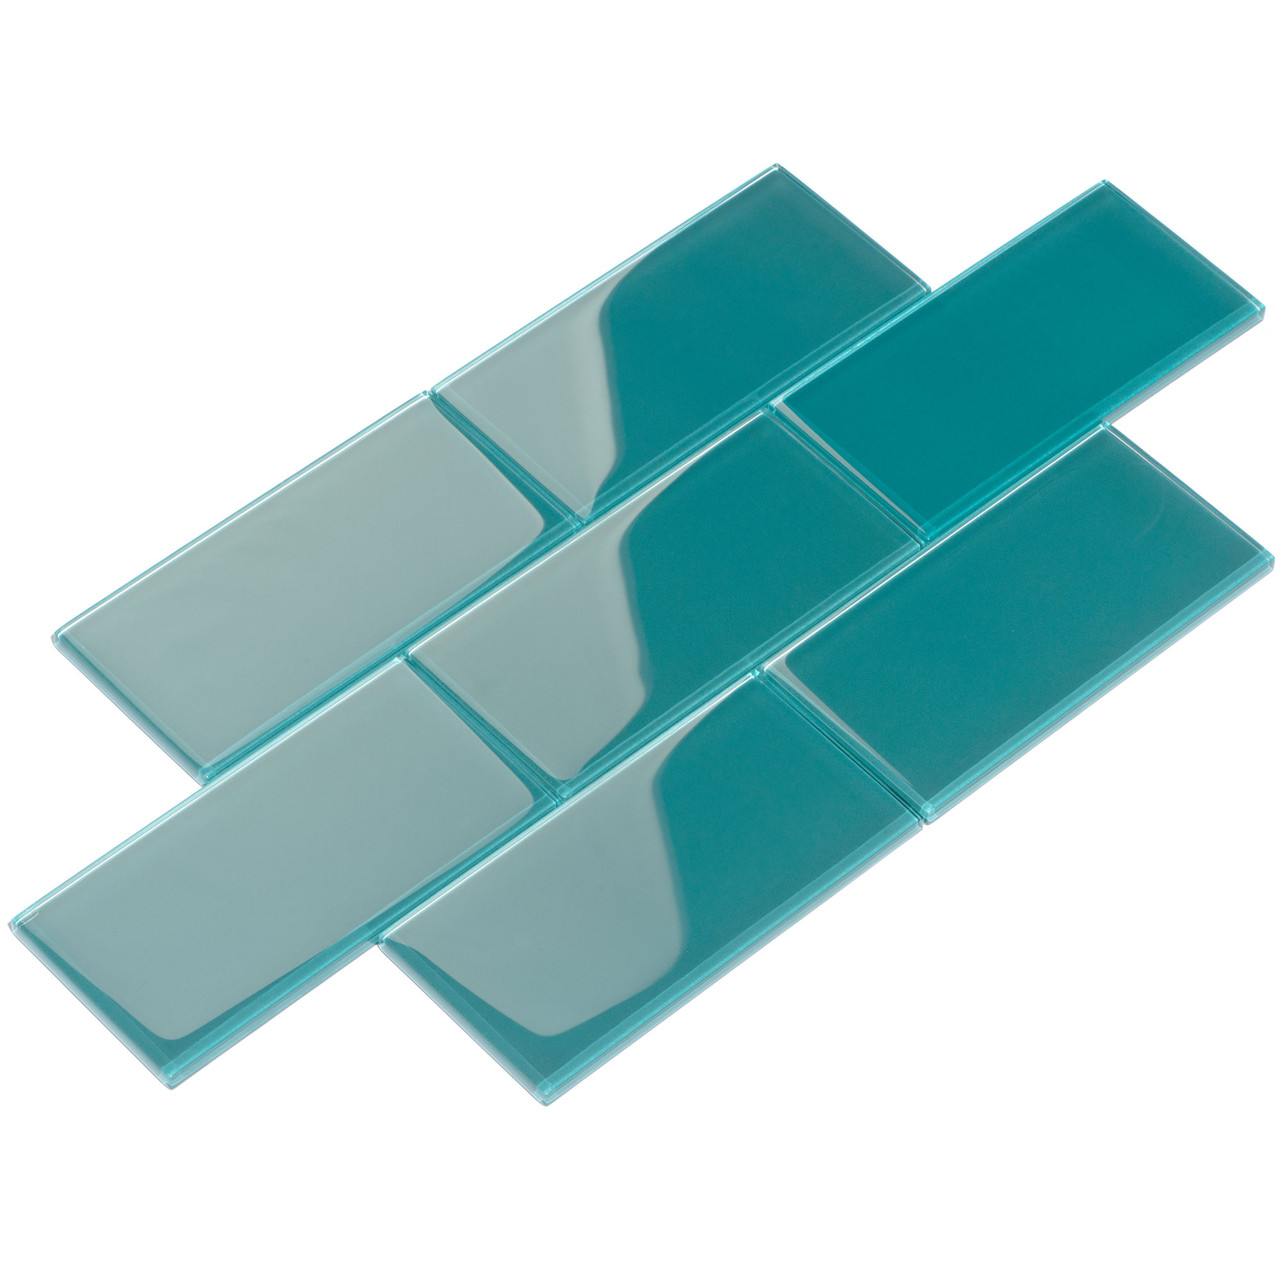 giorbello glass subway tile 3 x 6 dark teal